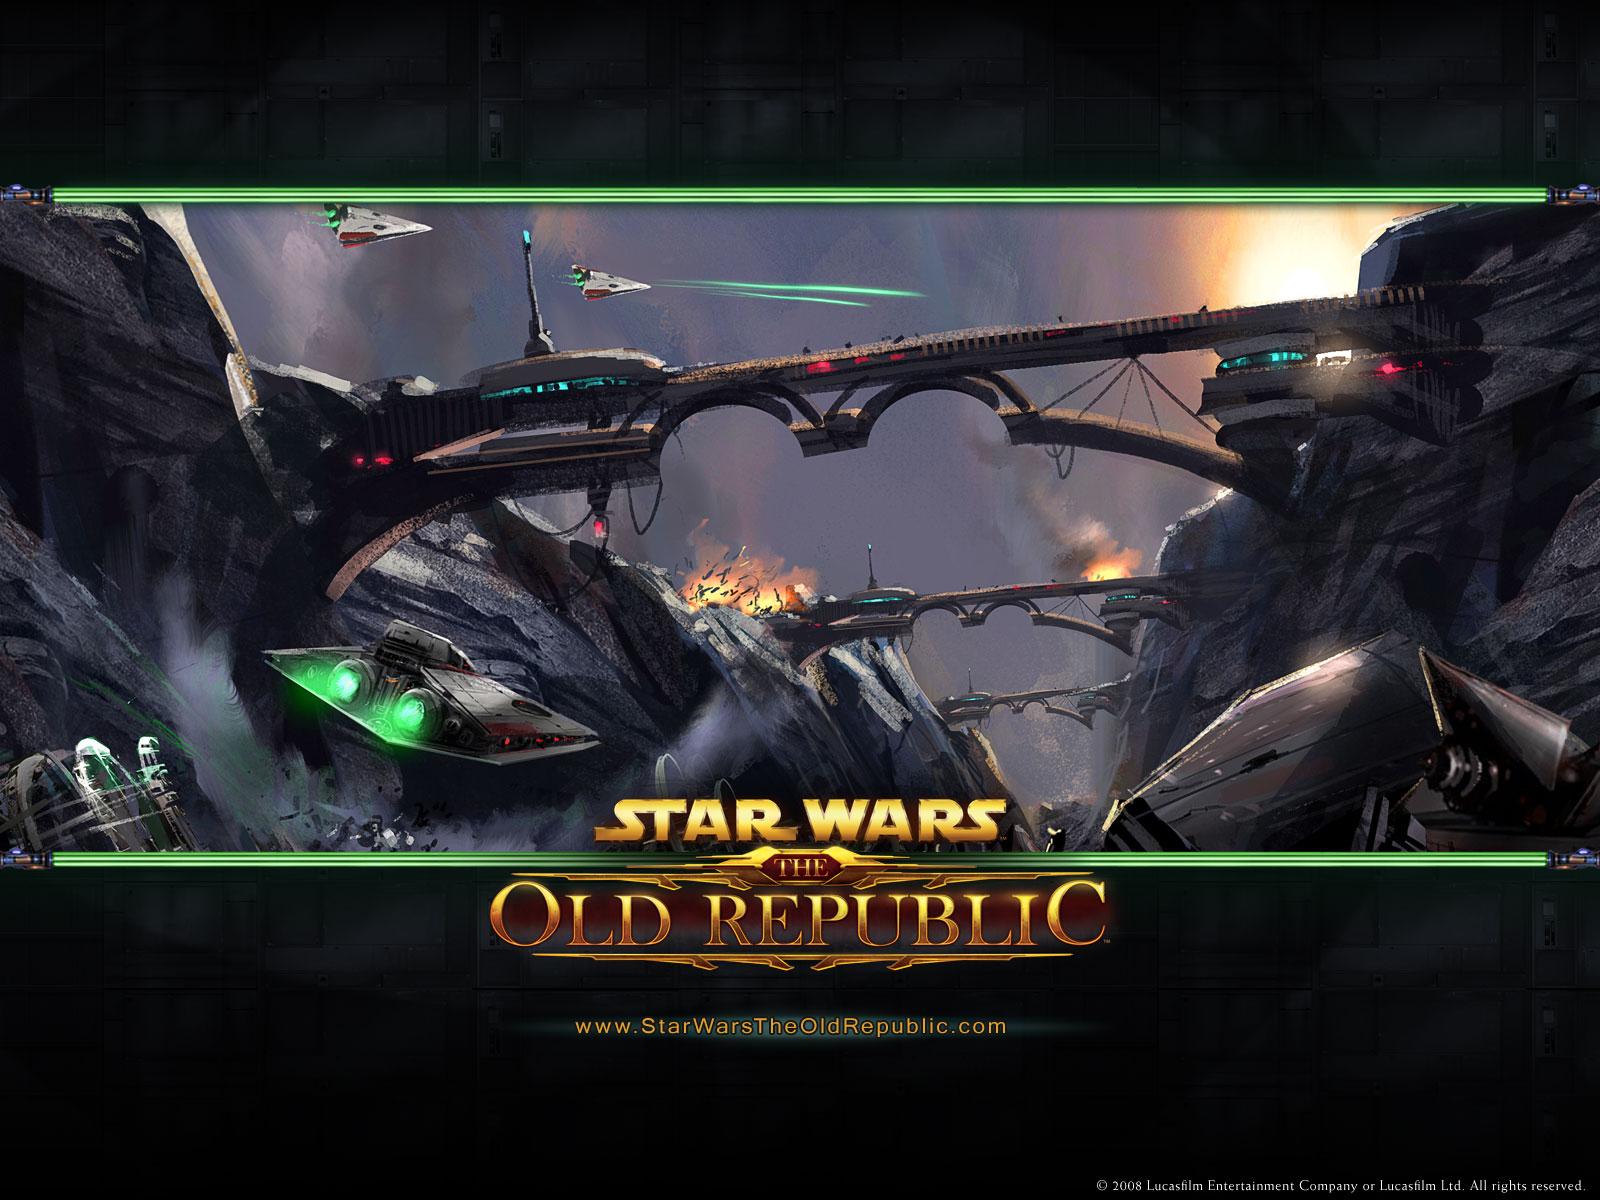 http://1.bp.blogspot.com/-xWkcCrVSYao/TjGkCUYkAPI/AAAAAAAAYsw/lm6oQUffhRo/s1600/Star+Wars+-+The+Old+Republic+Wallpapers+%252838%2529.jpg